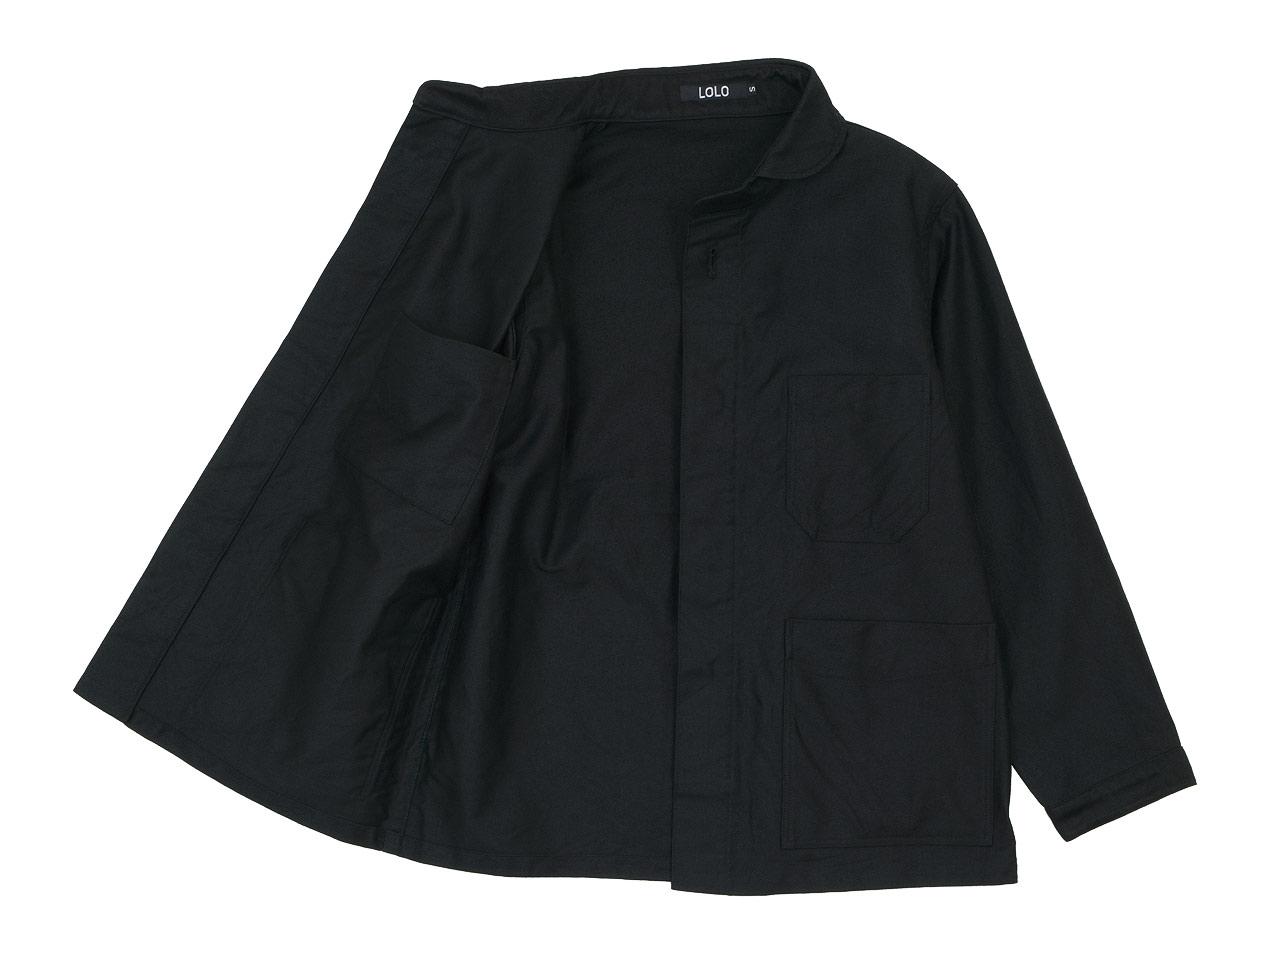 LOLO モールスキン 丸襟カバーオール